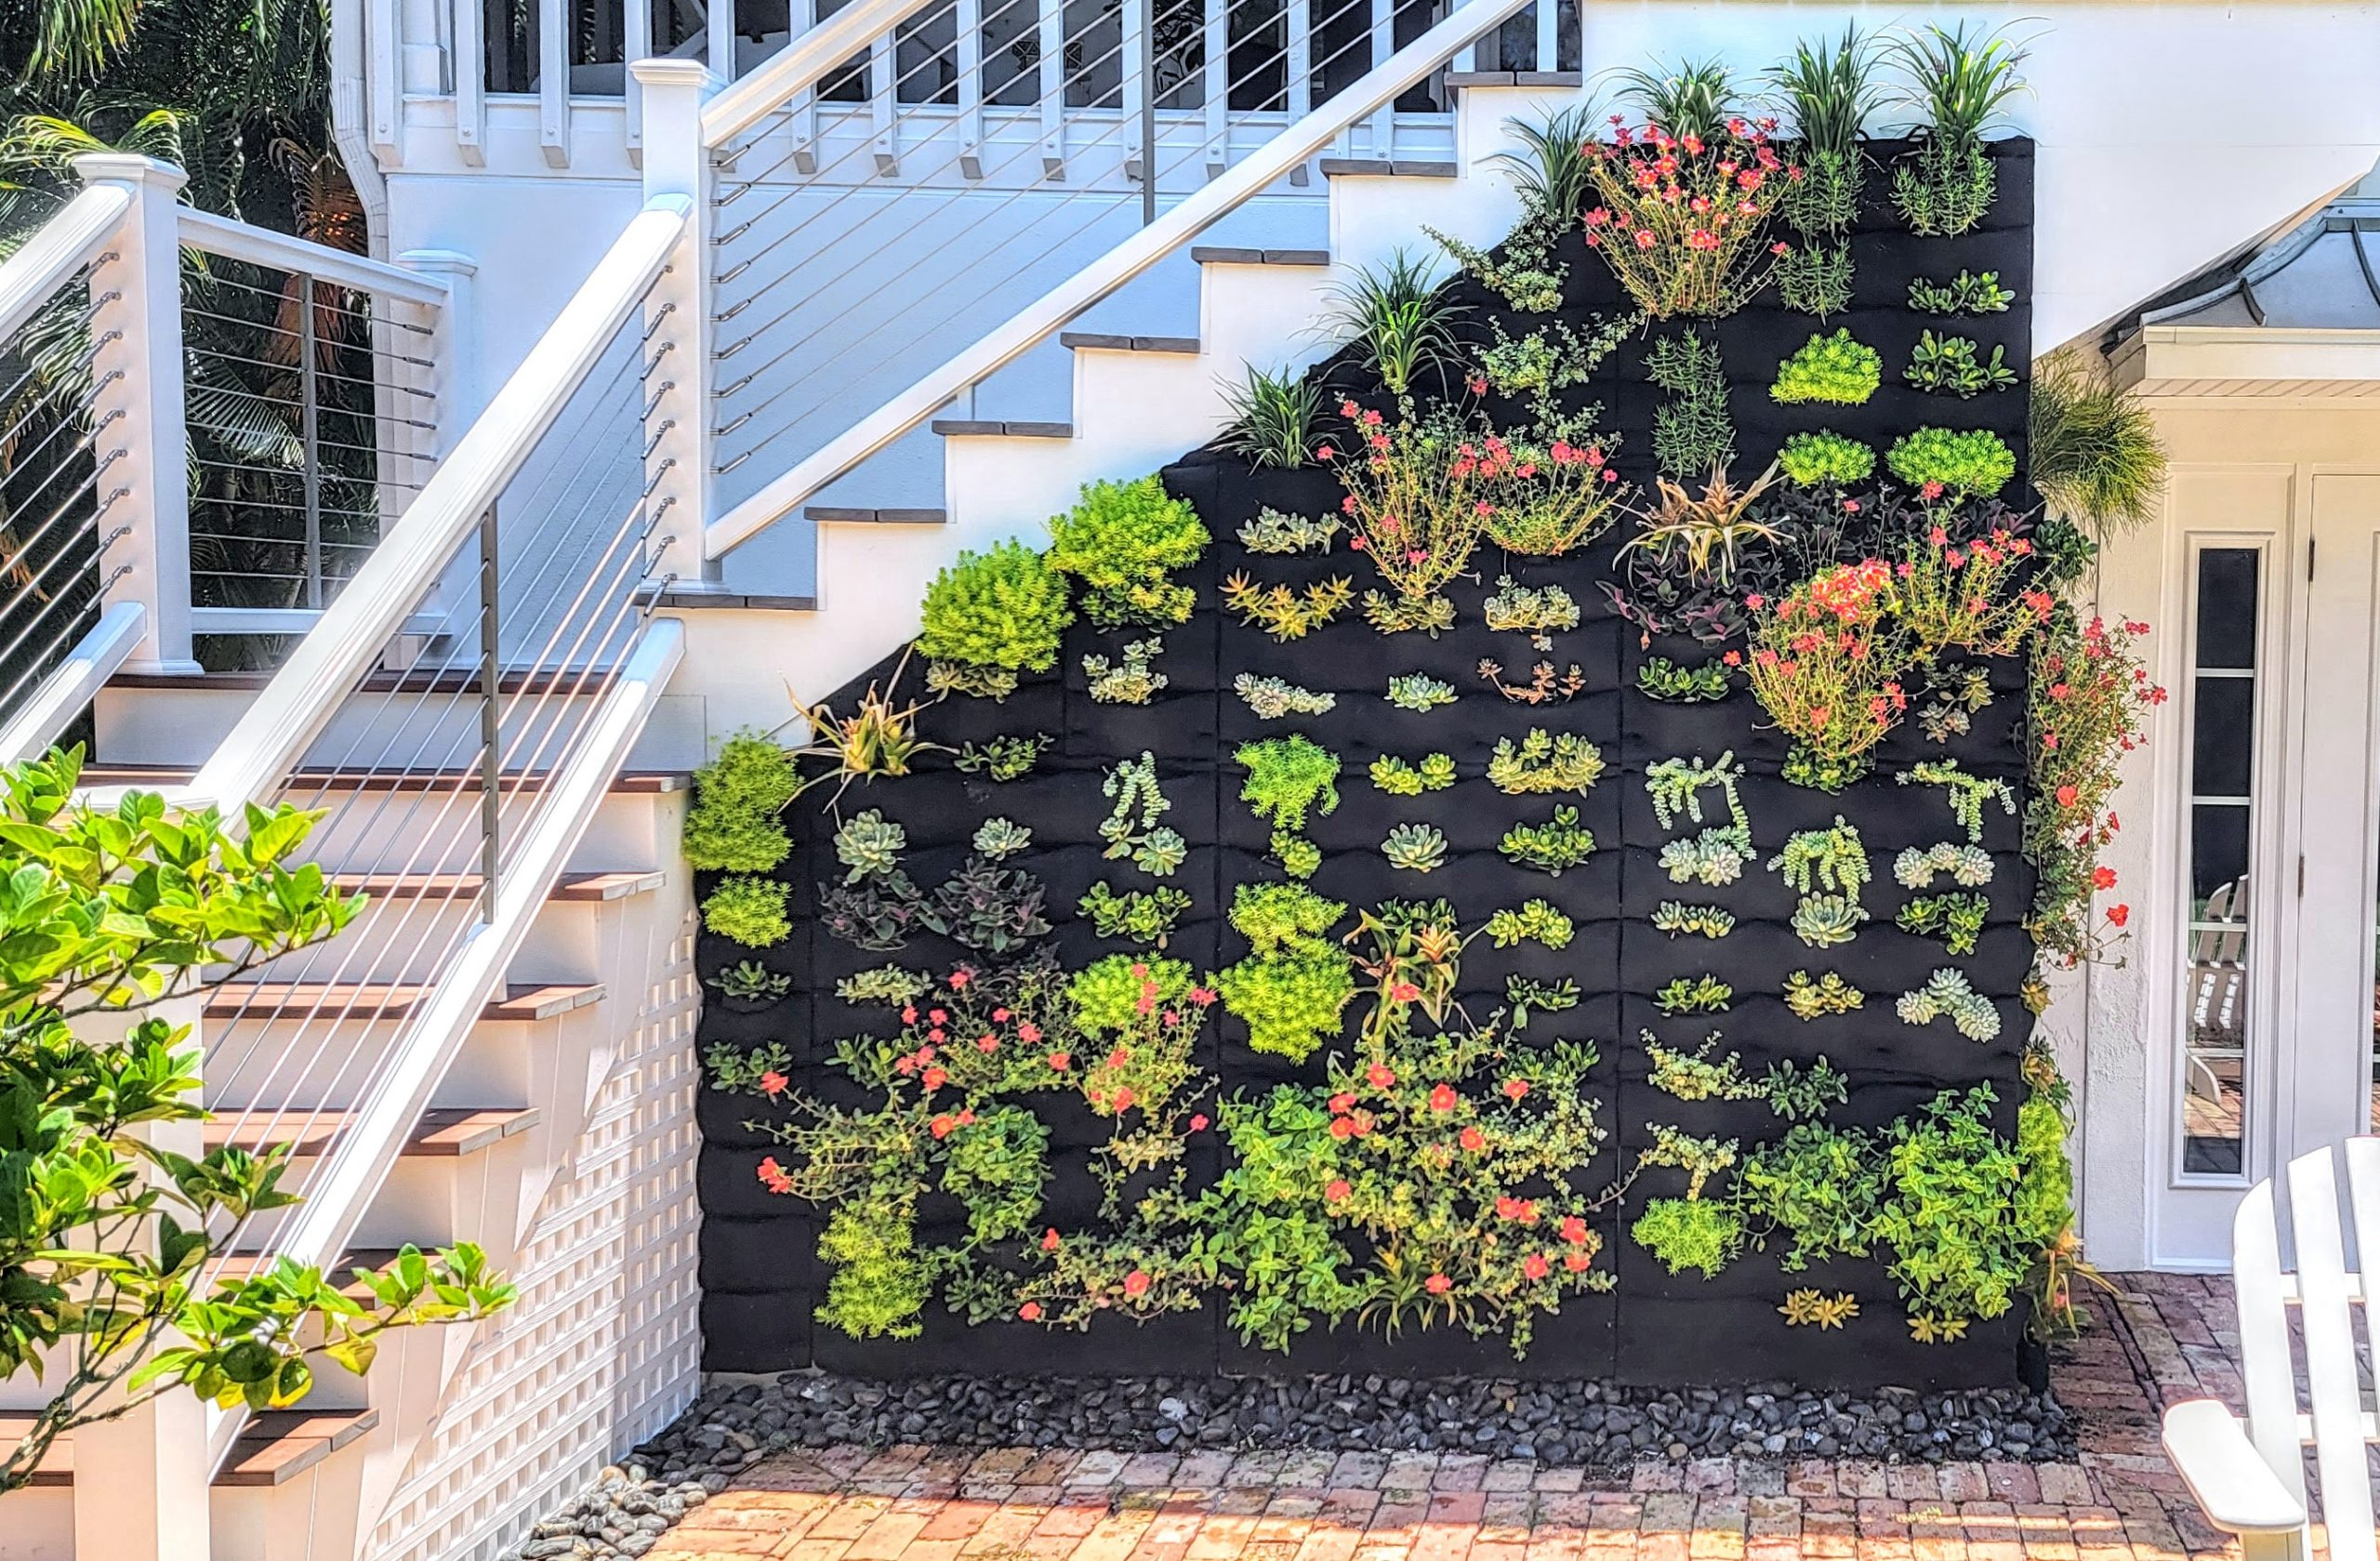 Florafelt Pockets Living Wall by Gregg Pulisciano of The Geek Garden.